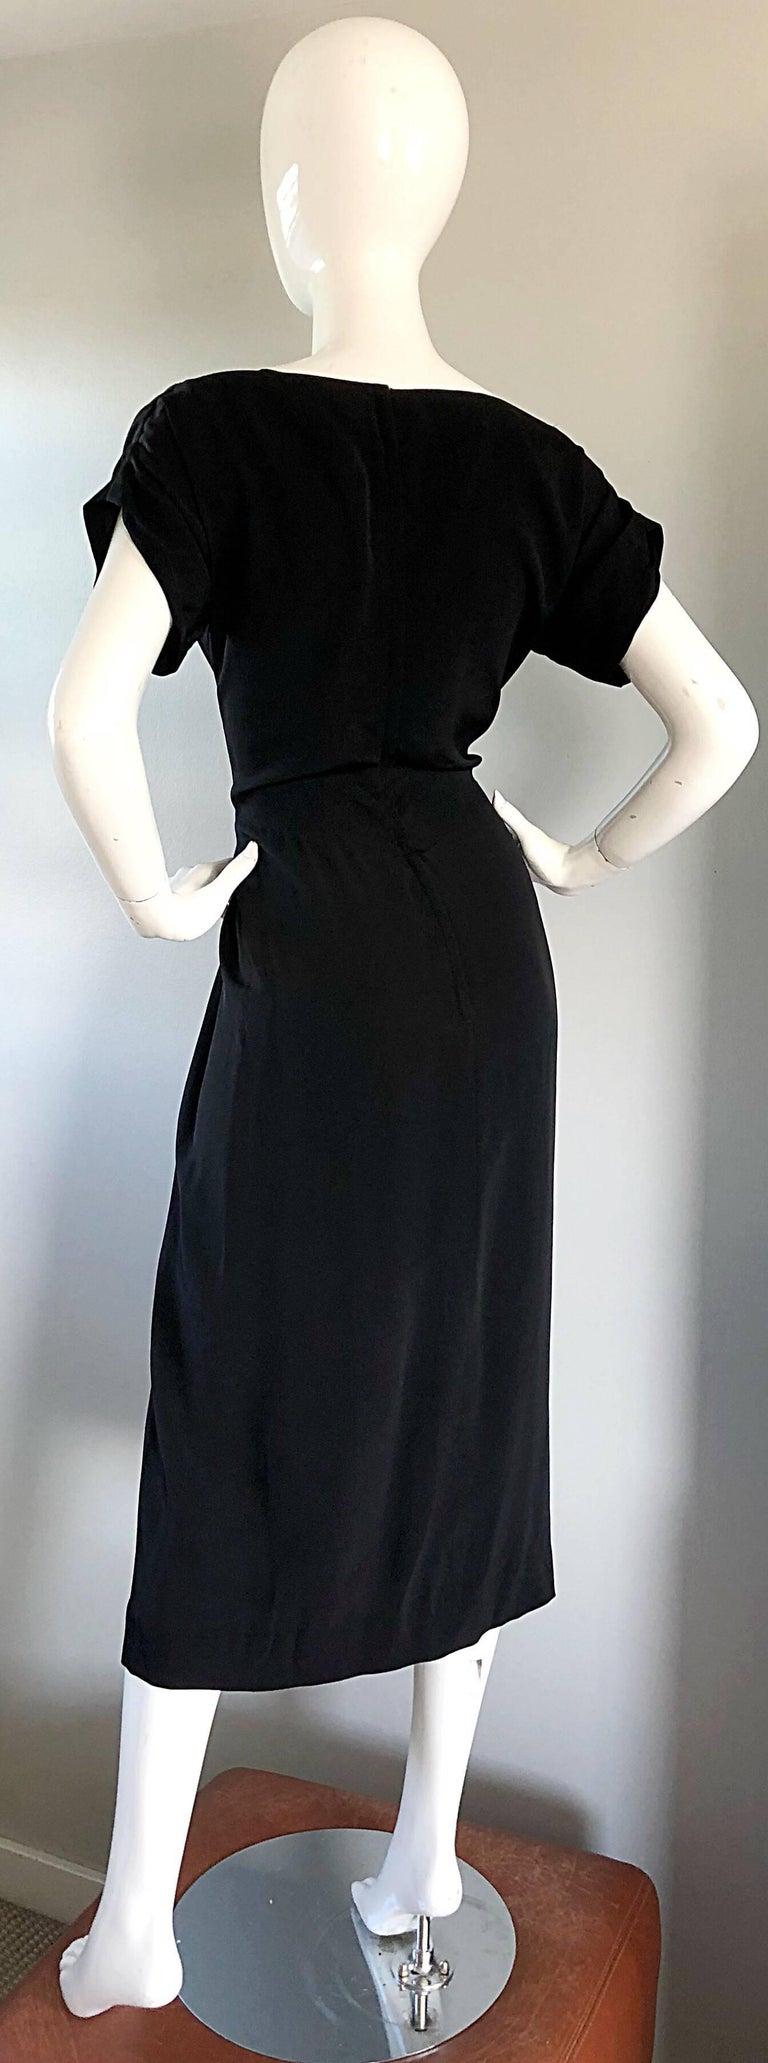 1950s Dorothy O'Hara Black Crepe Cap Sleeve Sweetheart Neck Vintage 50s Dress For Sale 4